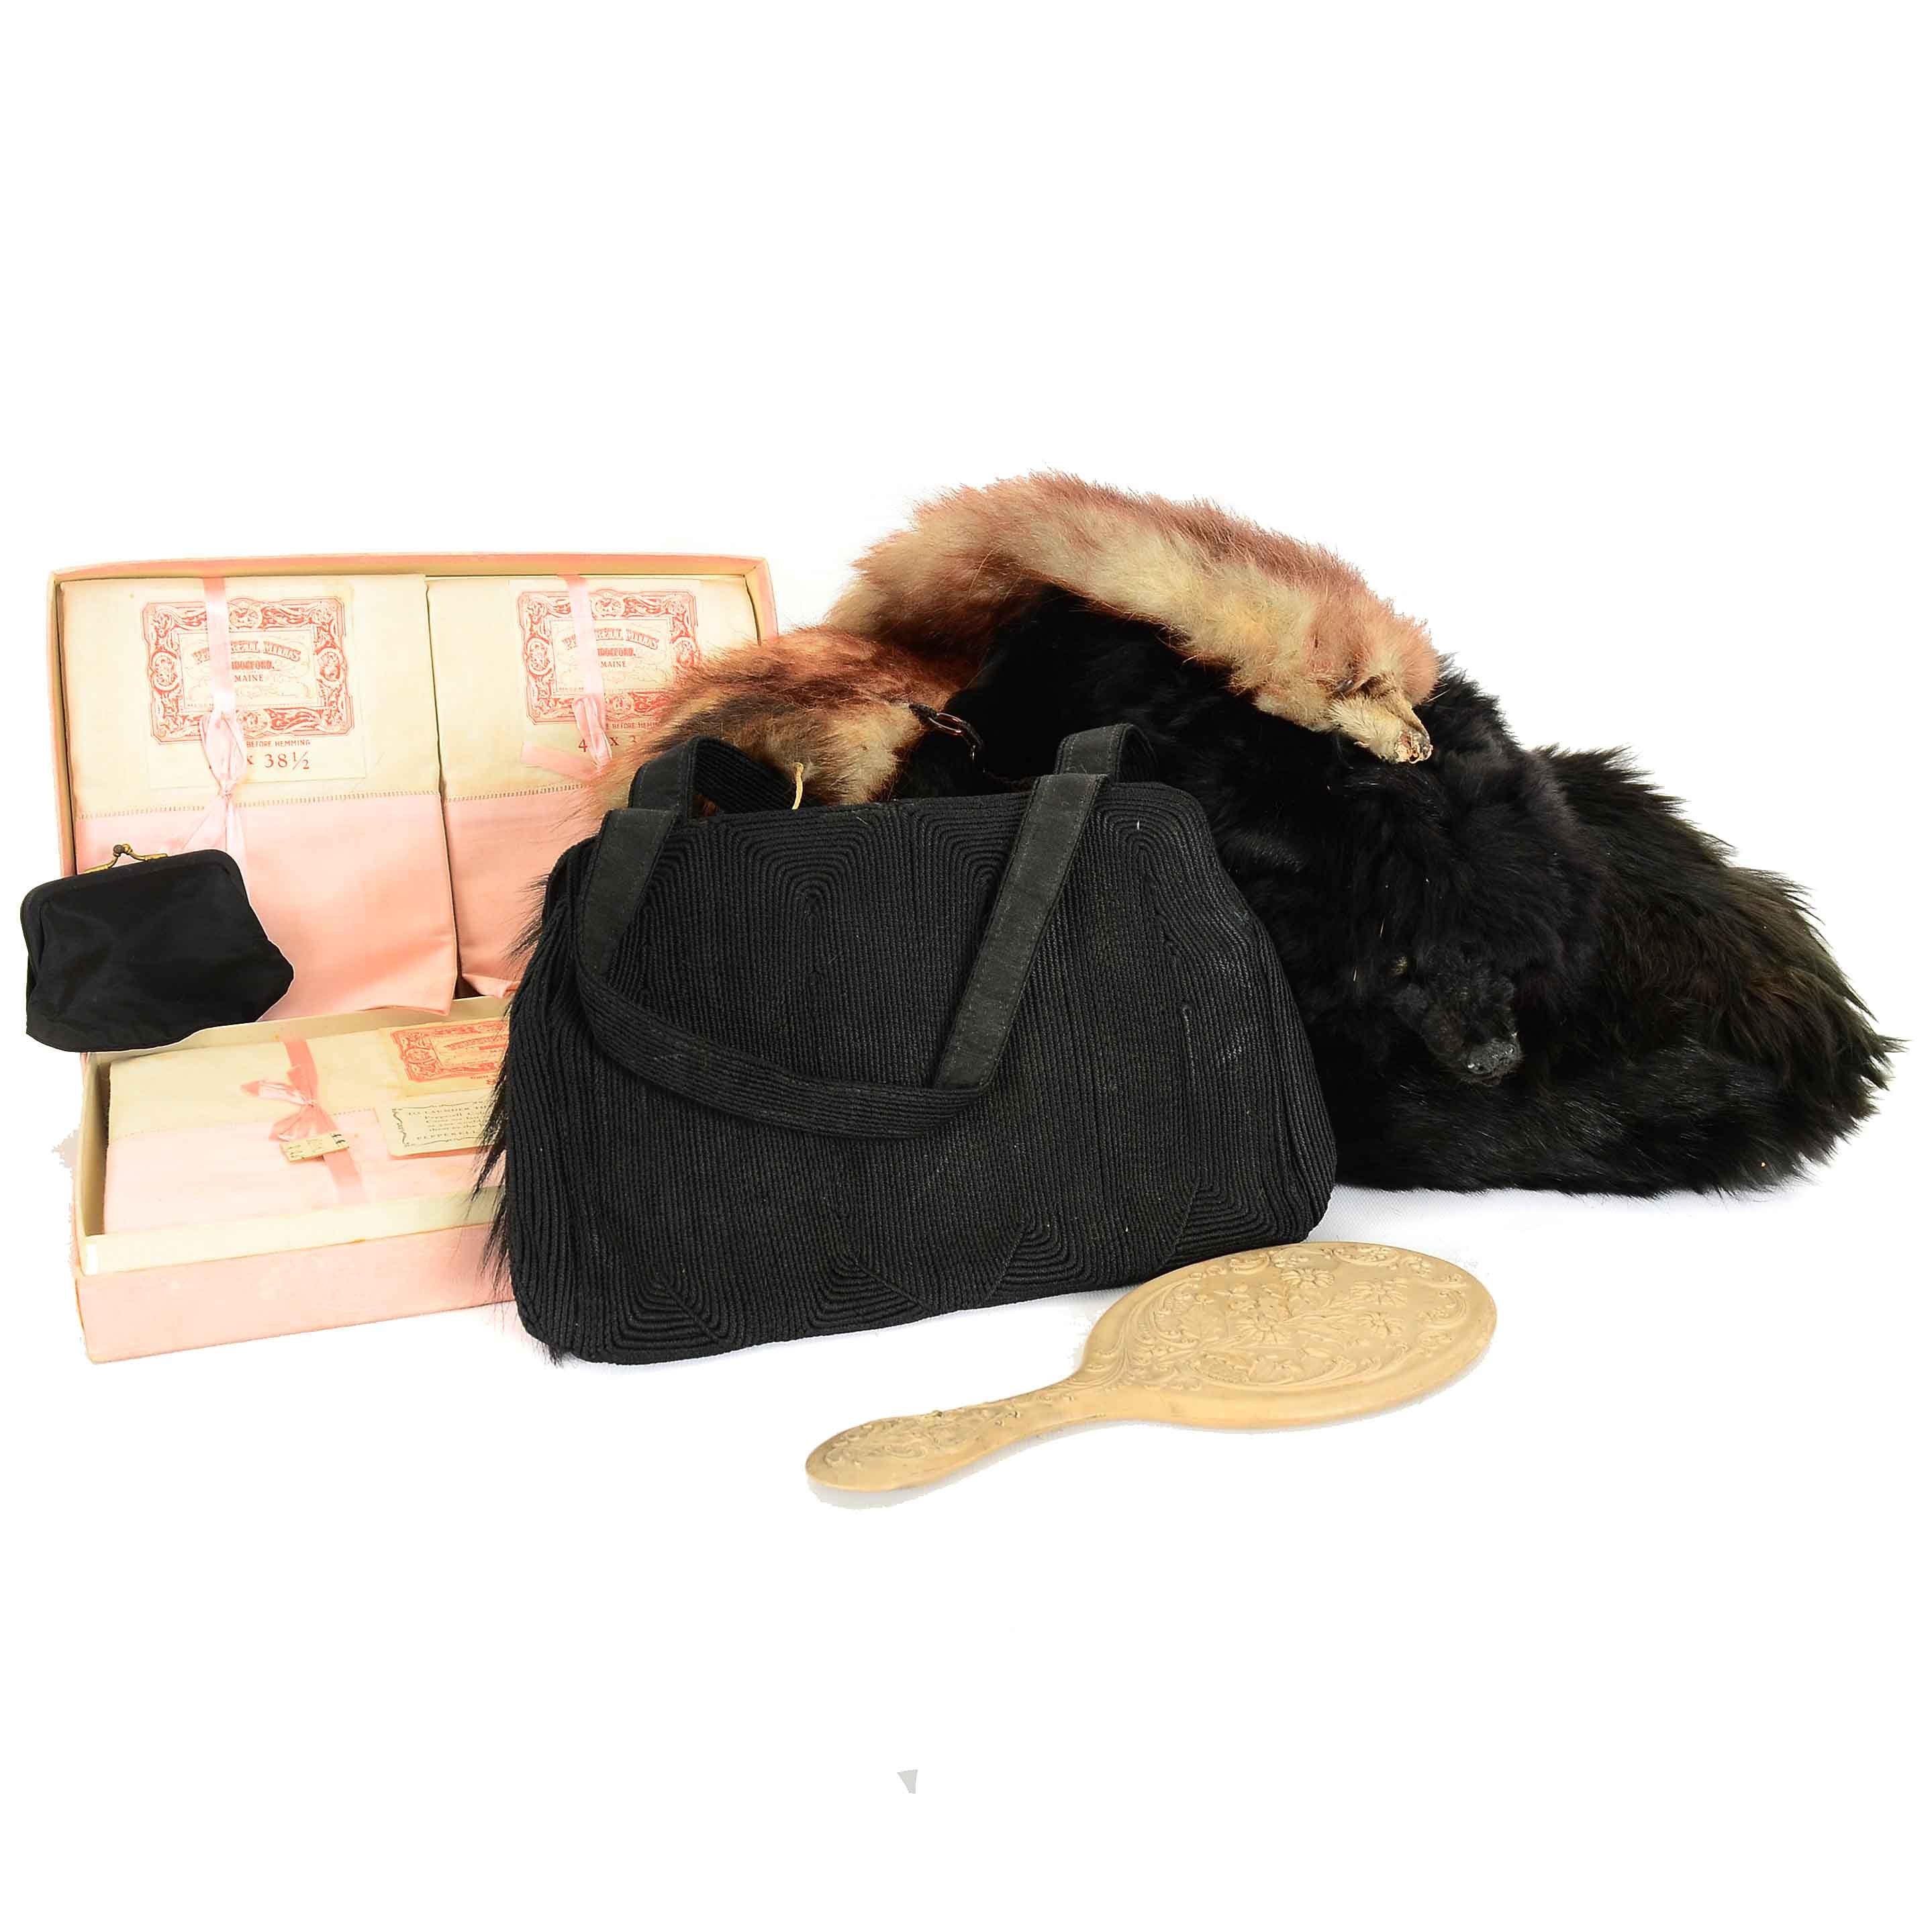 Vintage Muff, Pelts and Vanity Items Featuring Corde Handbag